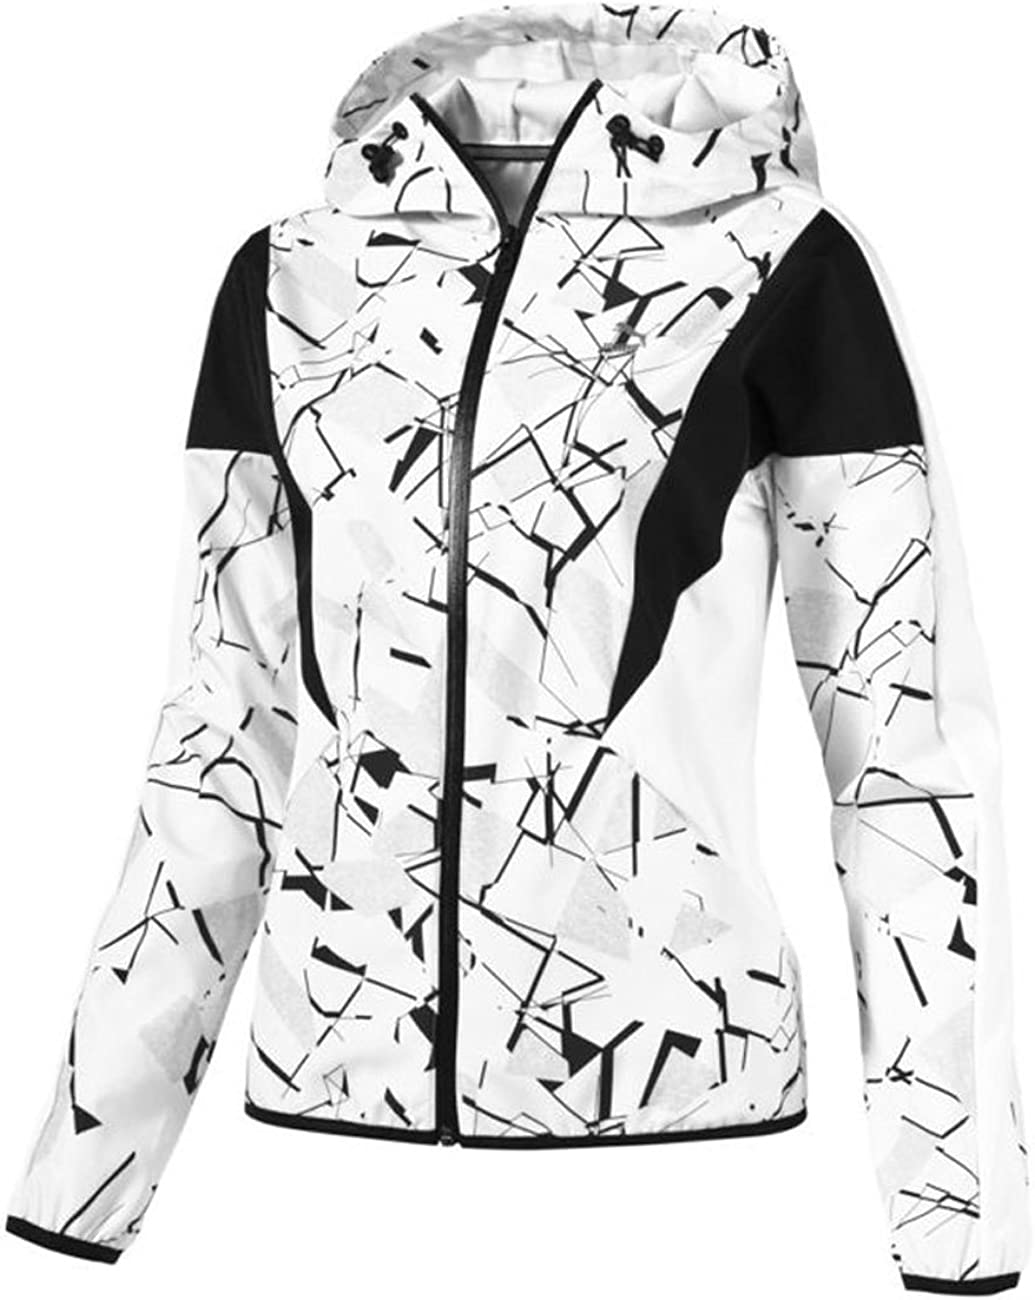 PUMA Women's Printed Windrunner Jacket